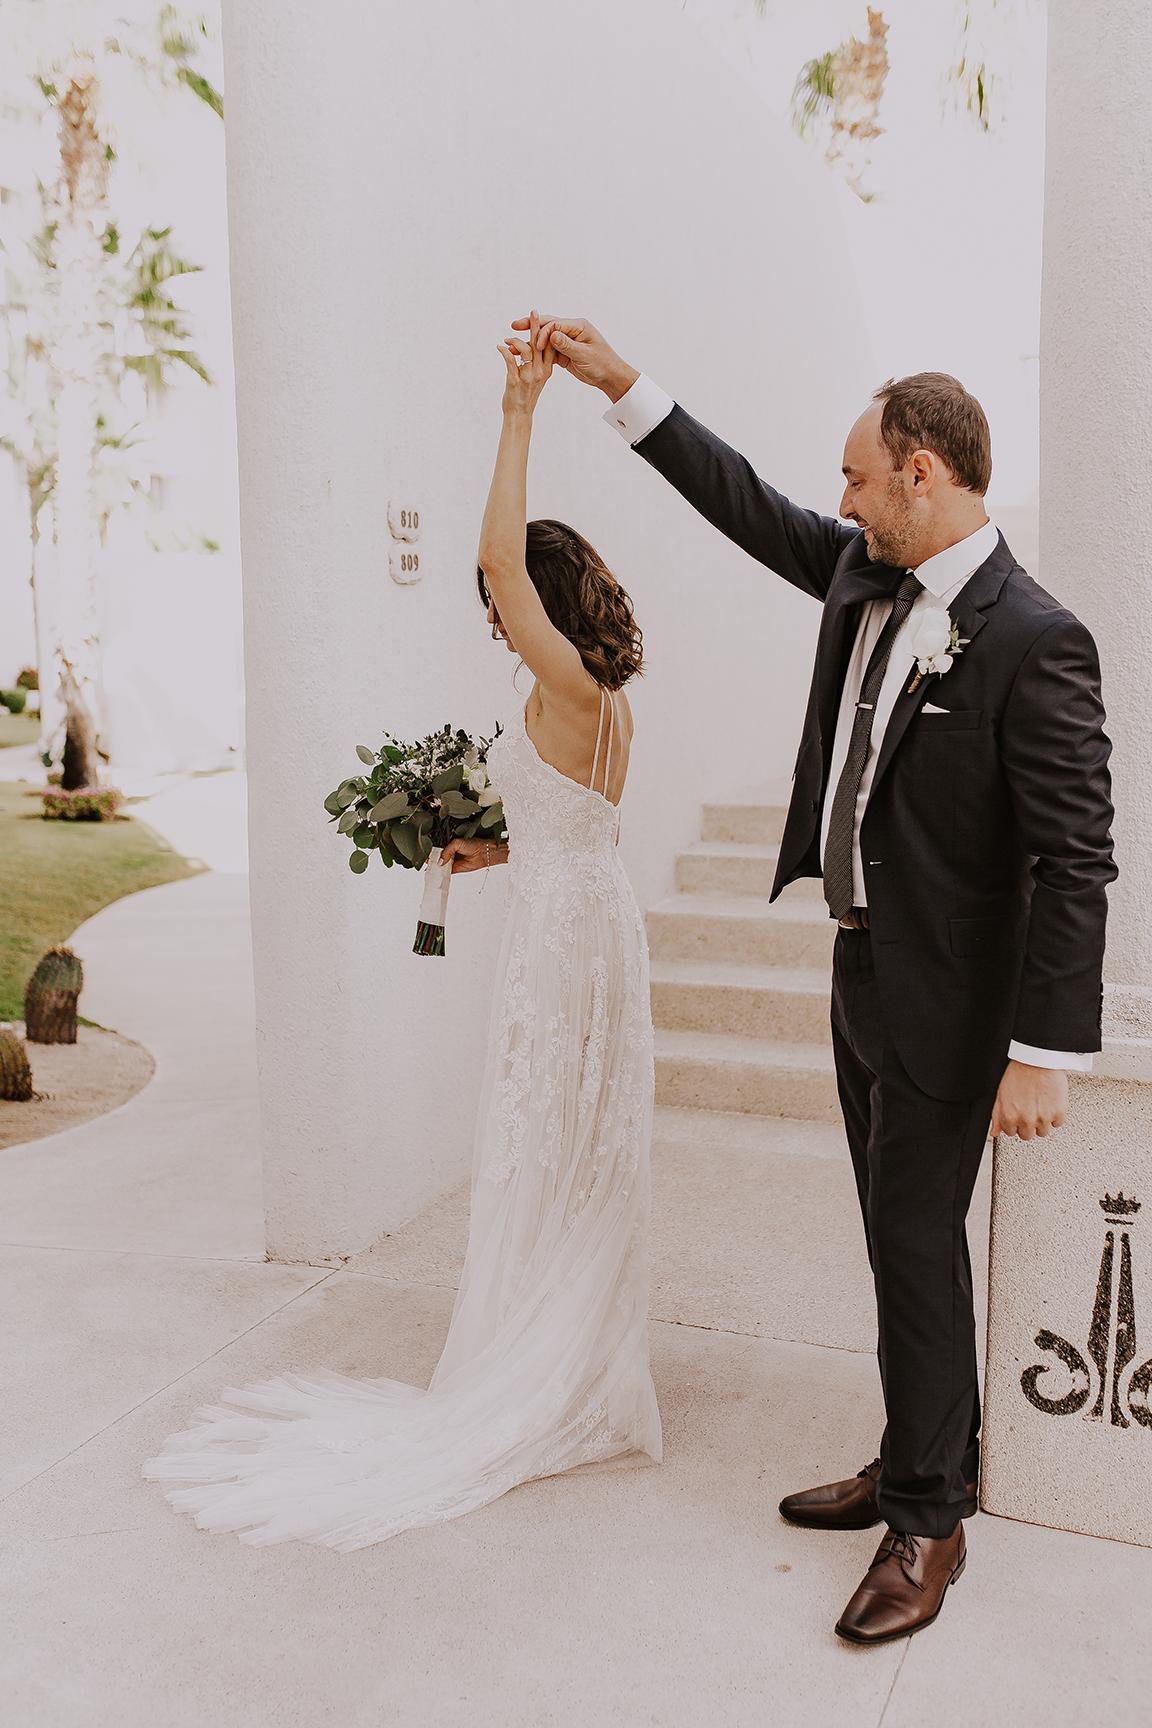 Lindsei+James_cabo_wedding_219.jpg